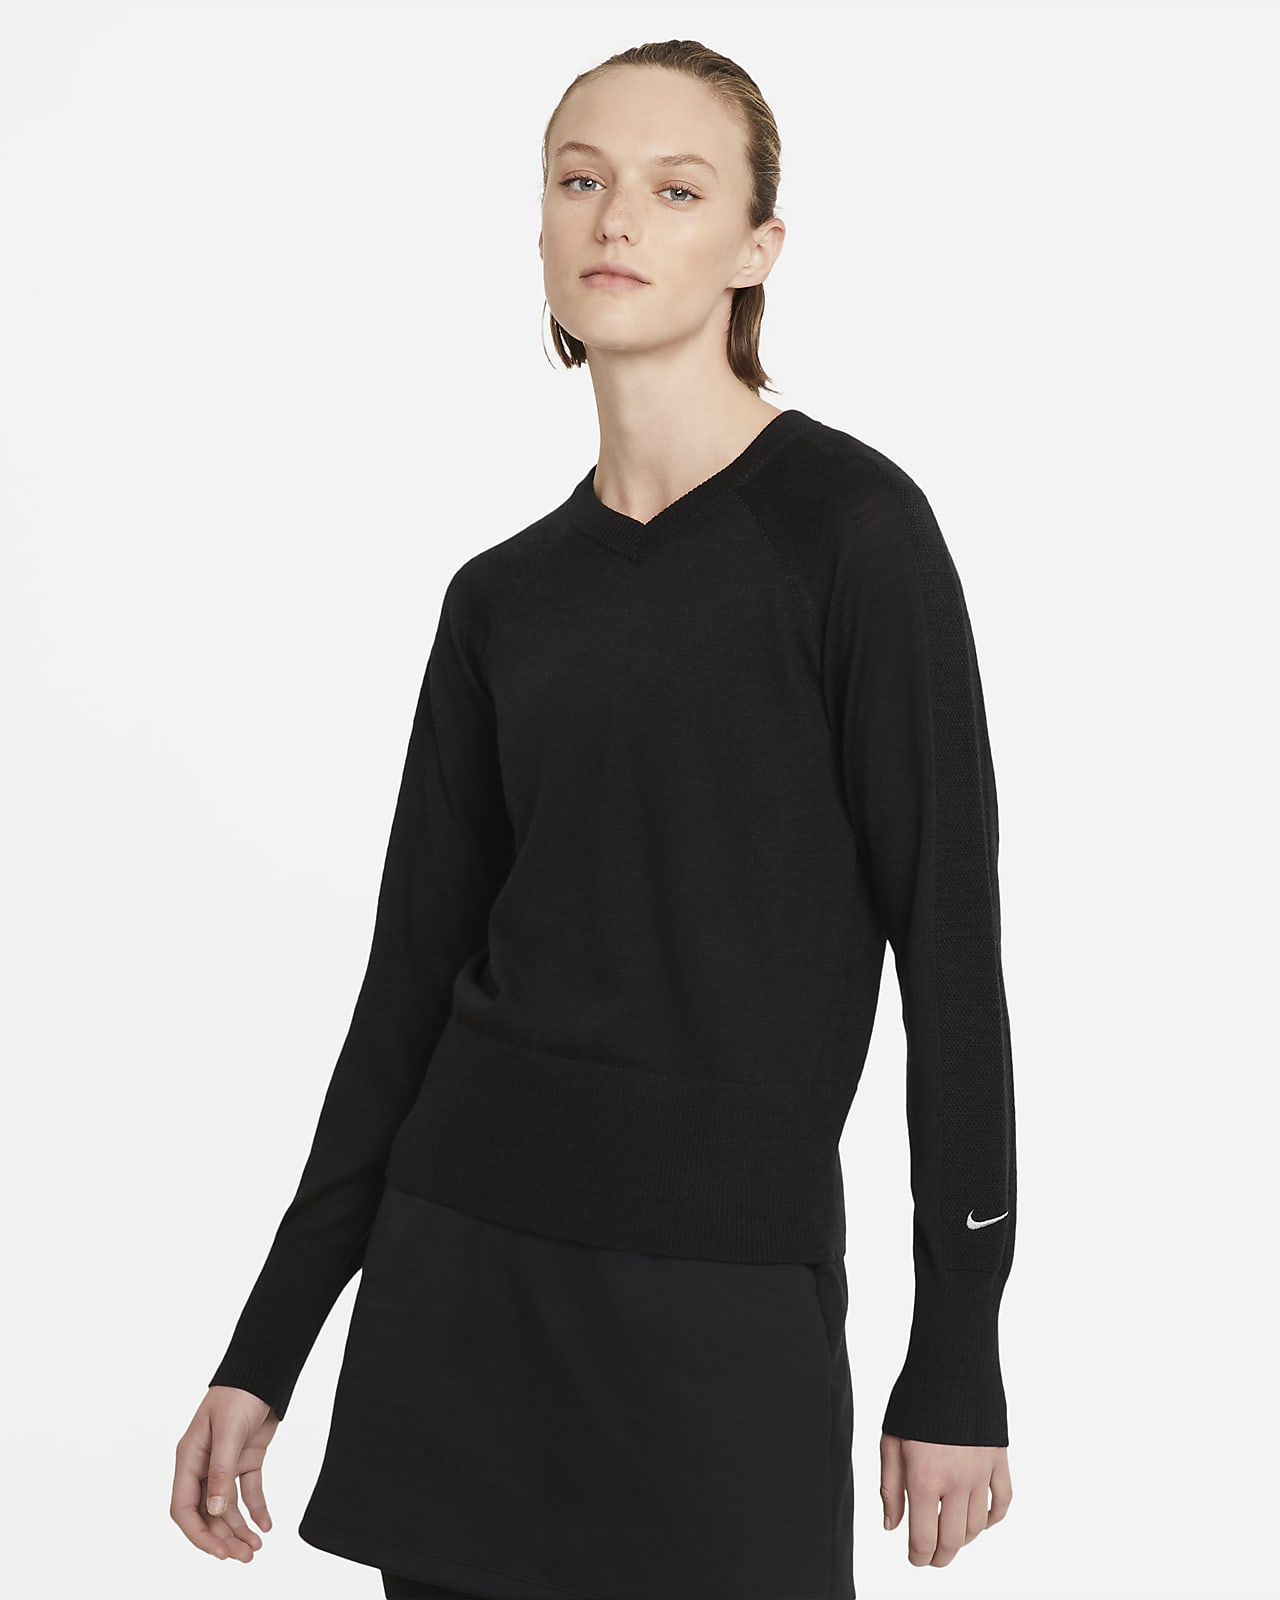 Nike Ace Women's Long-Sleeve Golf Jumper